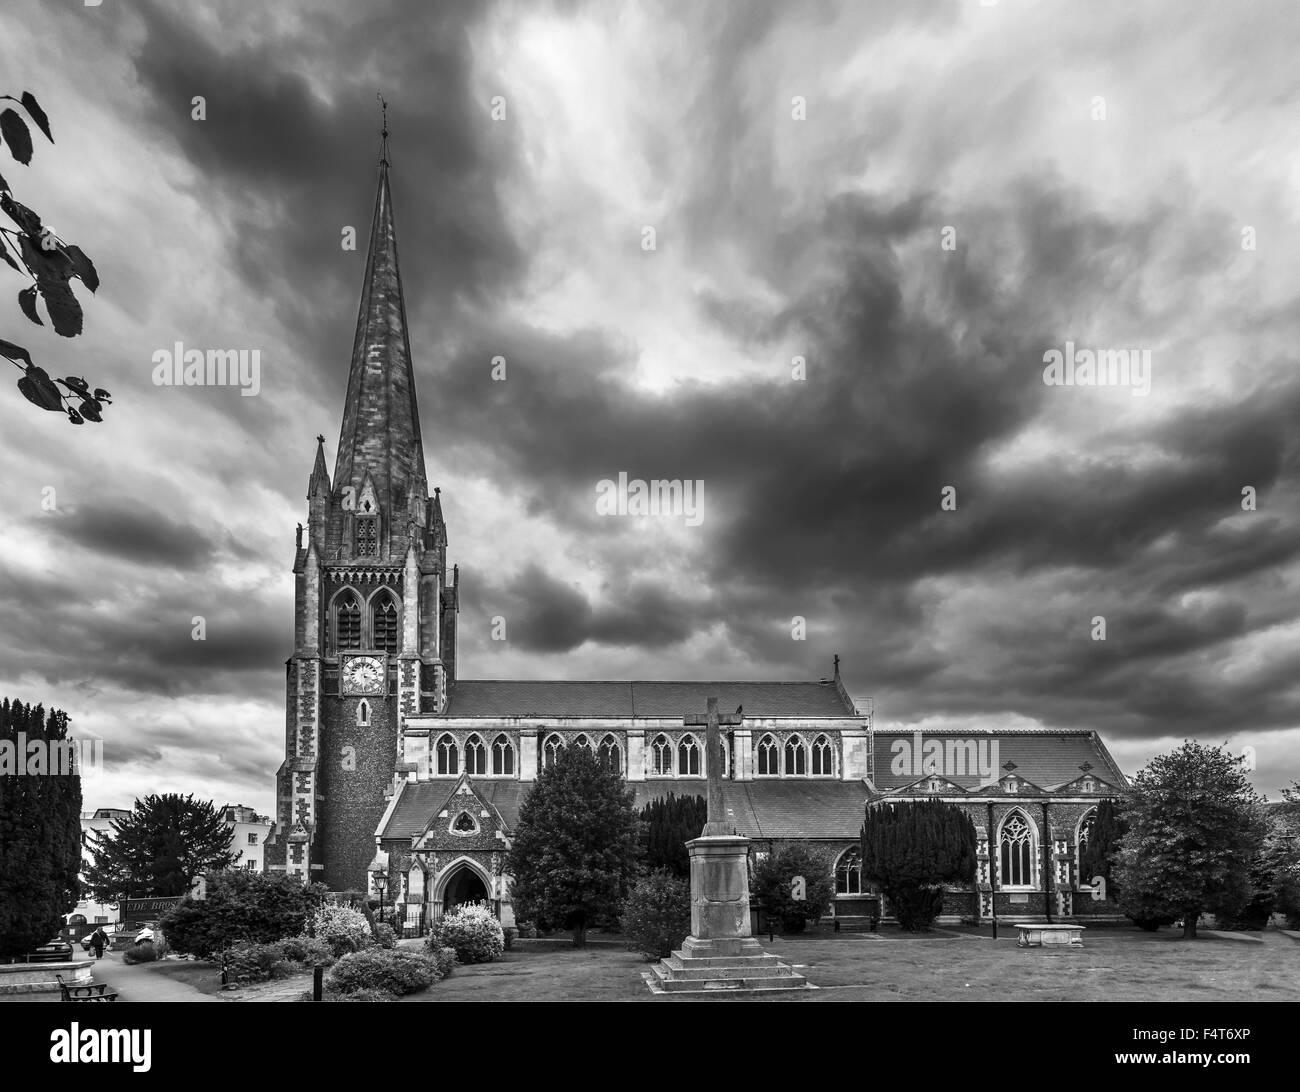 St Martin's Church in Dorking, Surrey UK - Stock Image